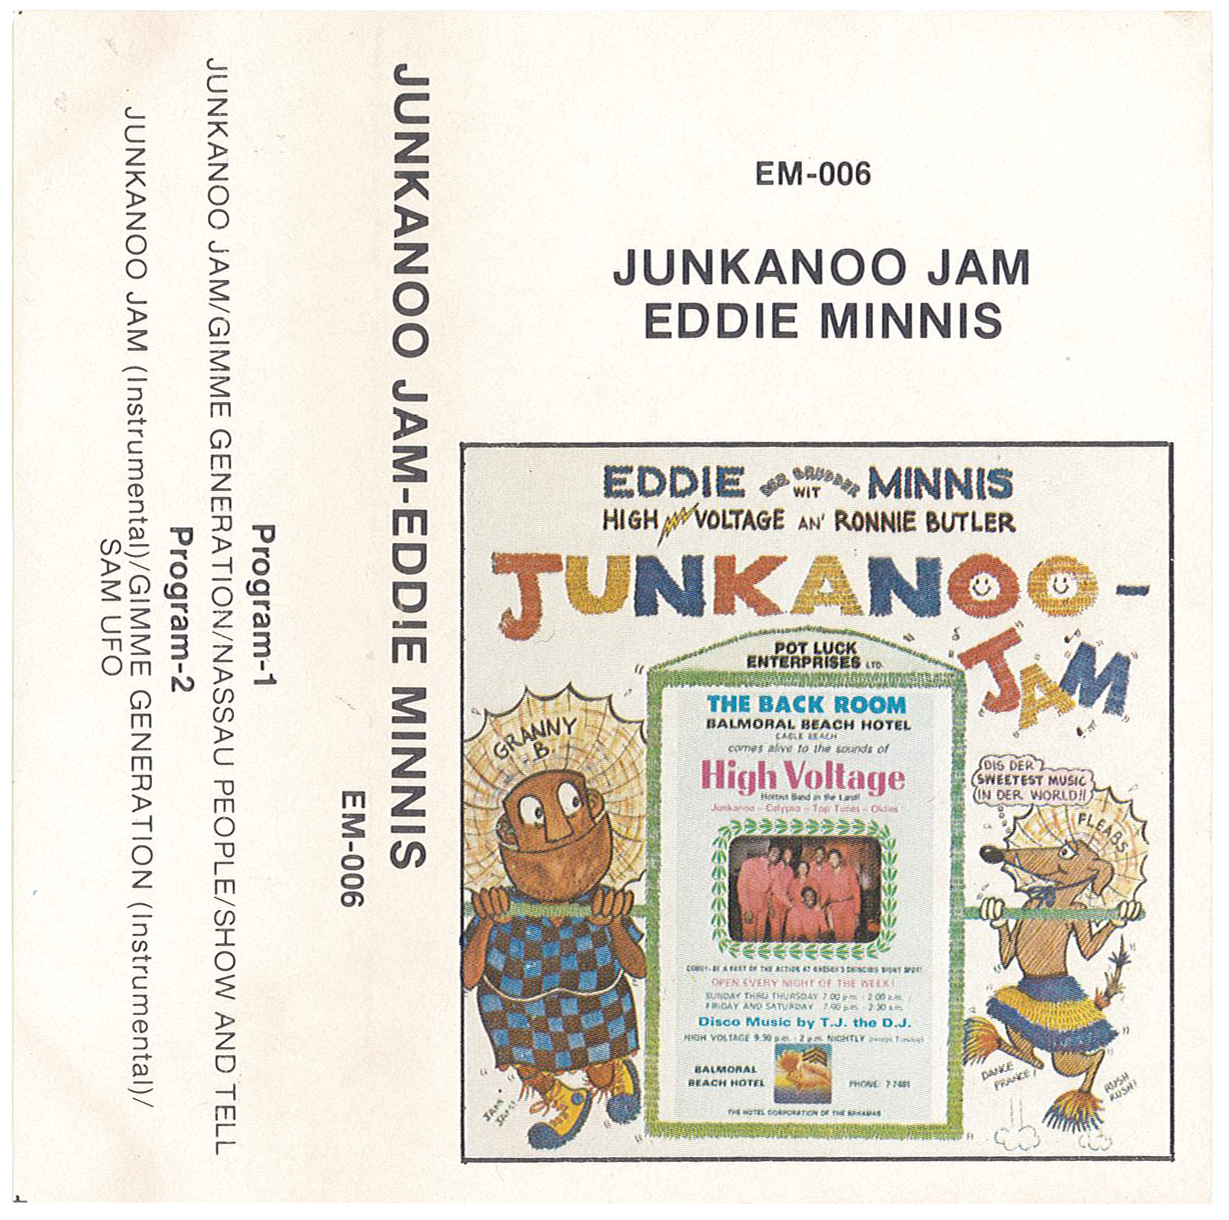 WLWLTDOO-1988-CS-EDDIE_MINNIS_JUNKANOO_JAM-JCARD-EM006.png